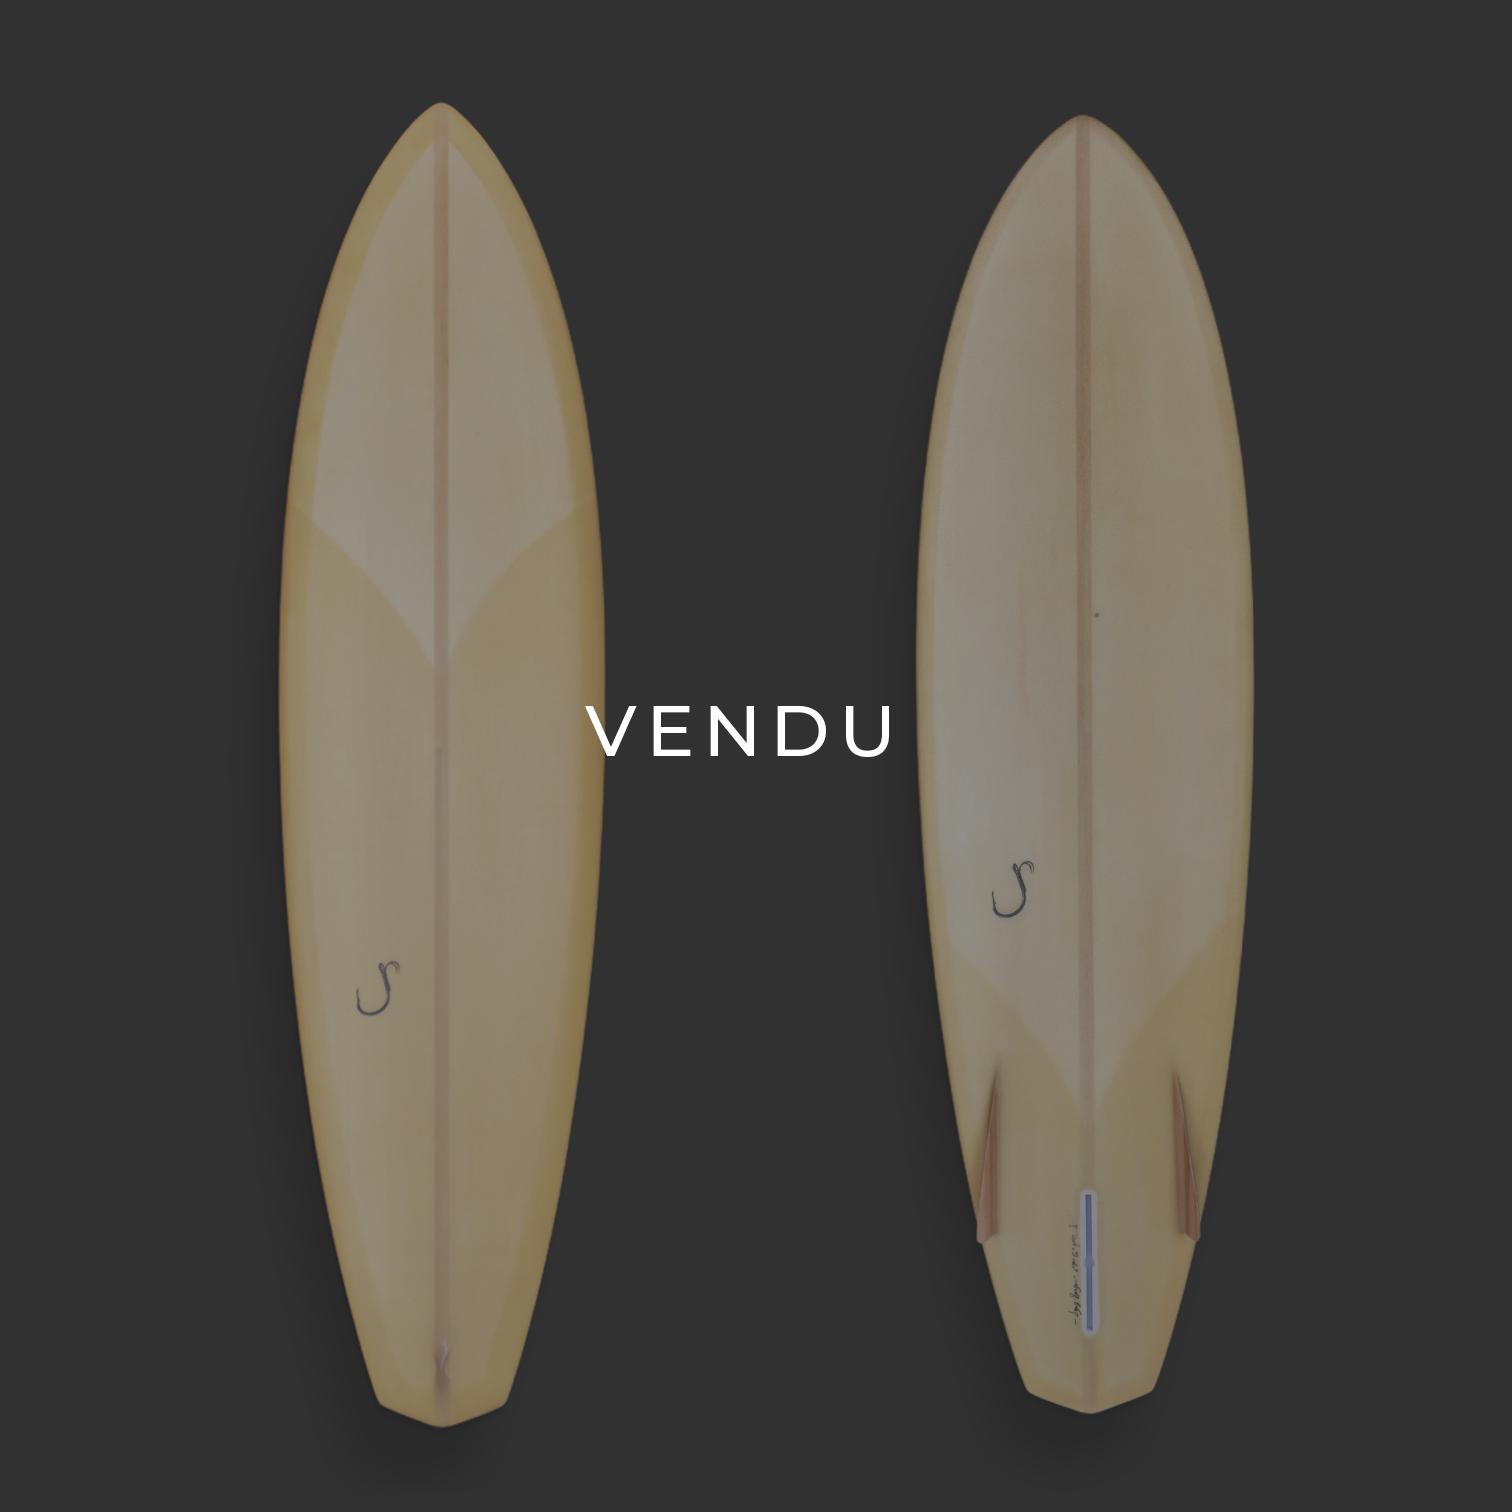 cachalot surfboards bonzer jaune planche surf handmade artisan shaper hollow bois eps